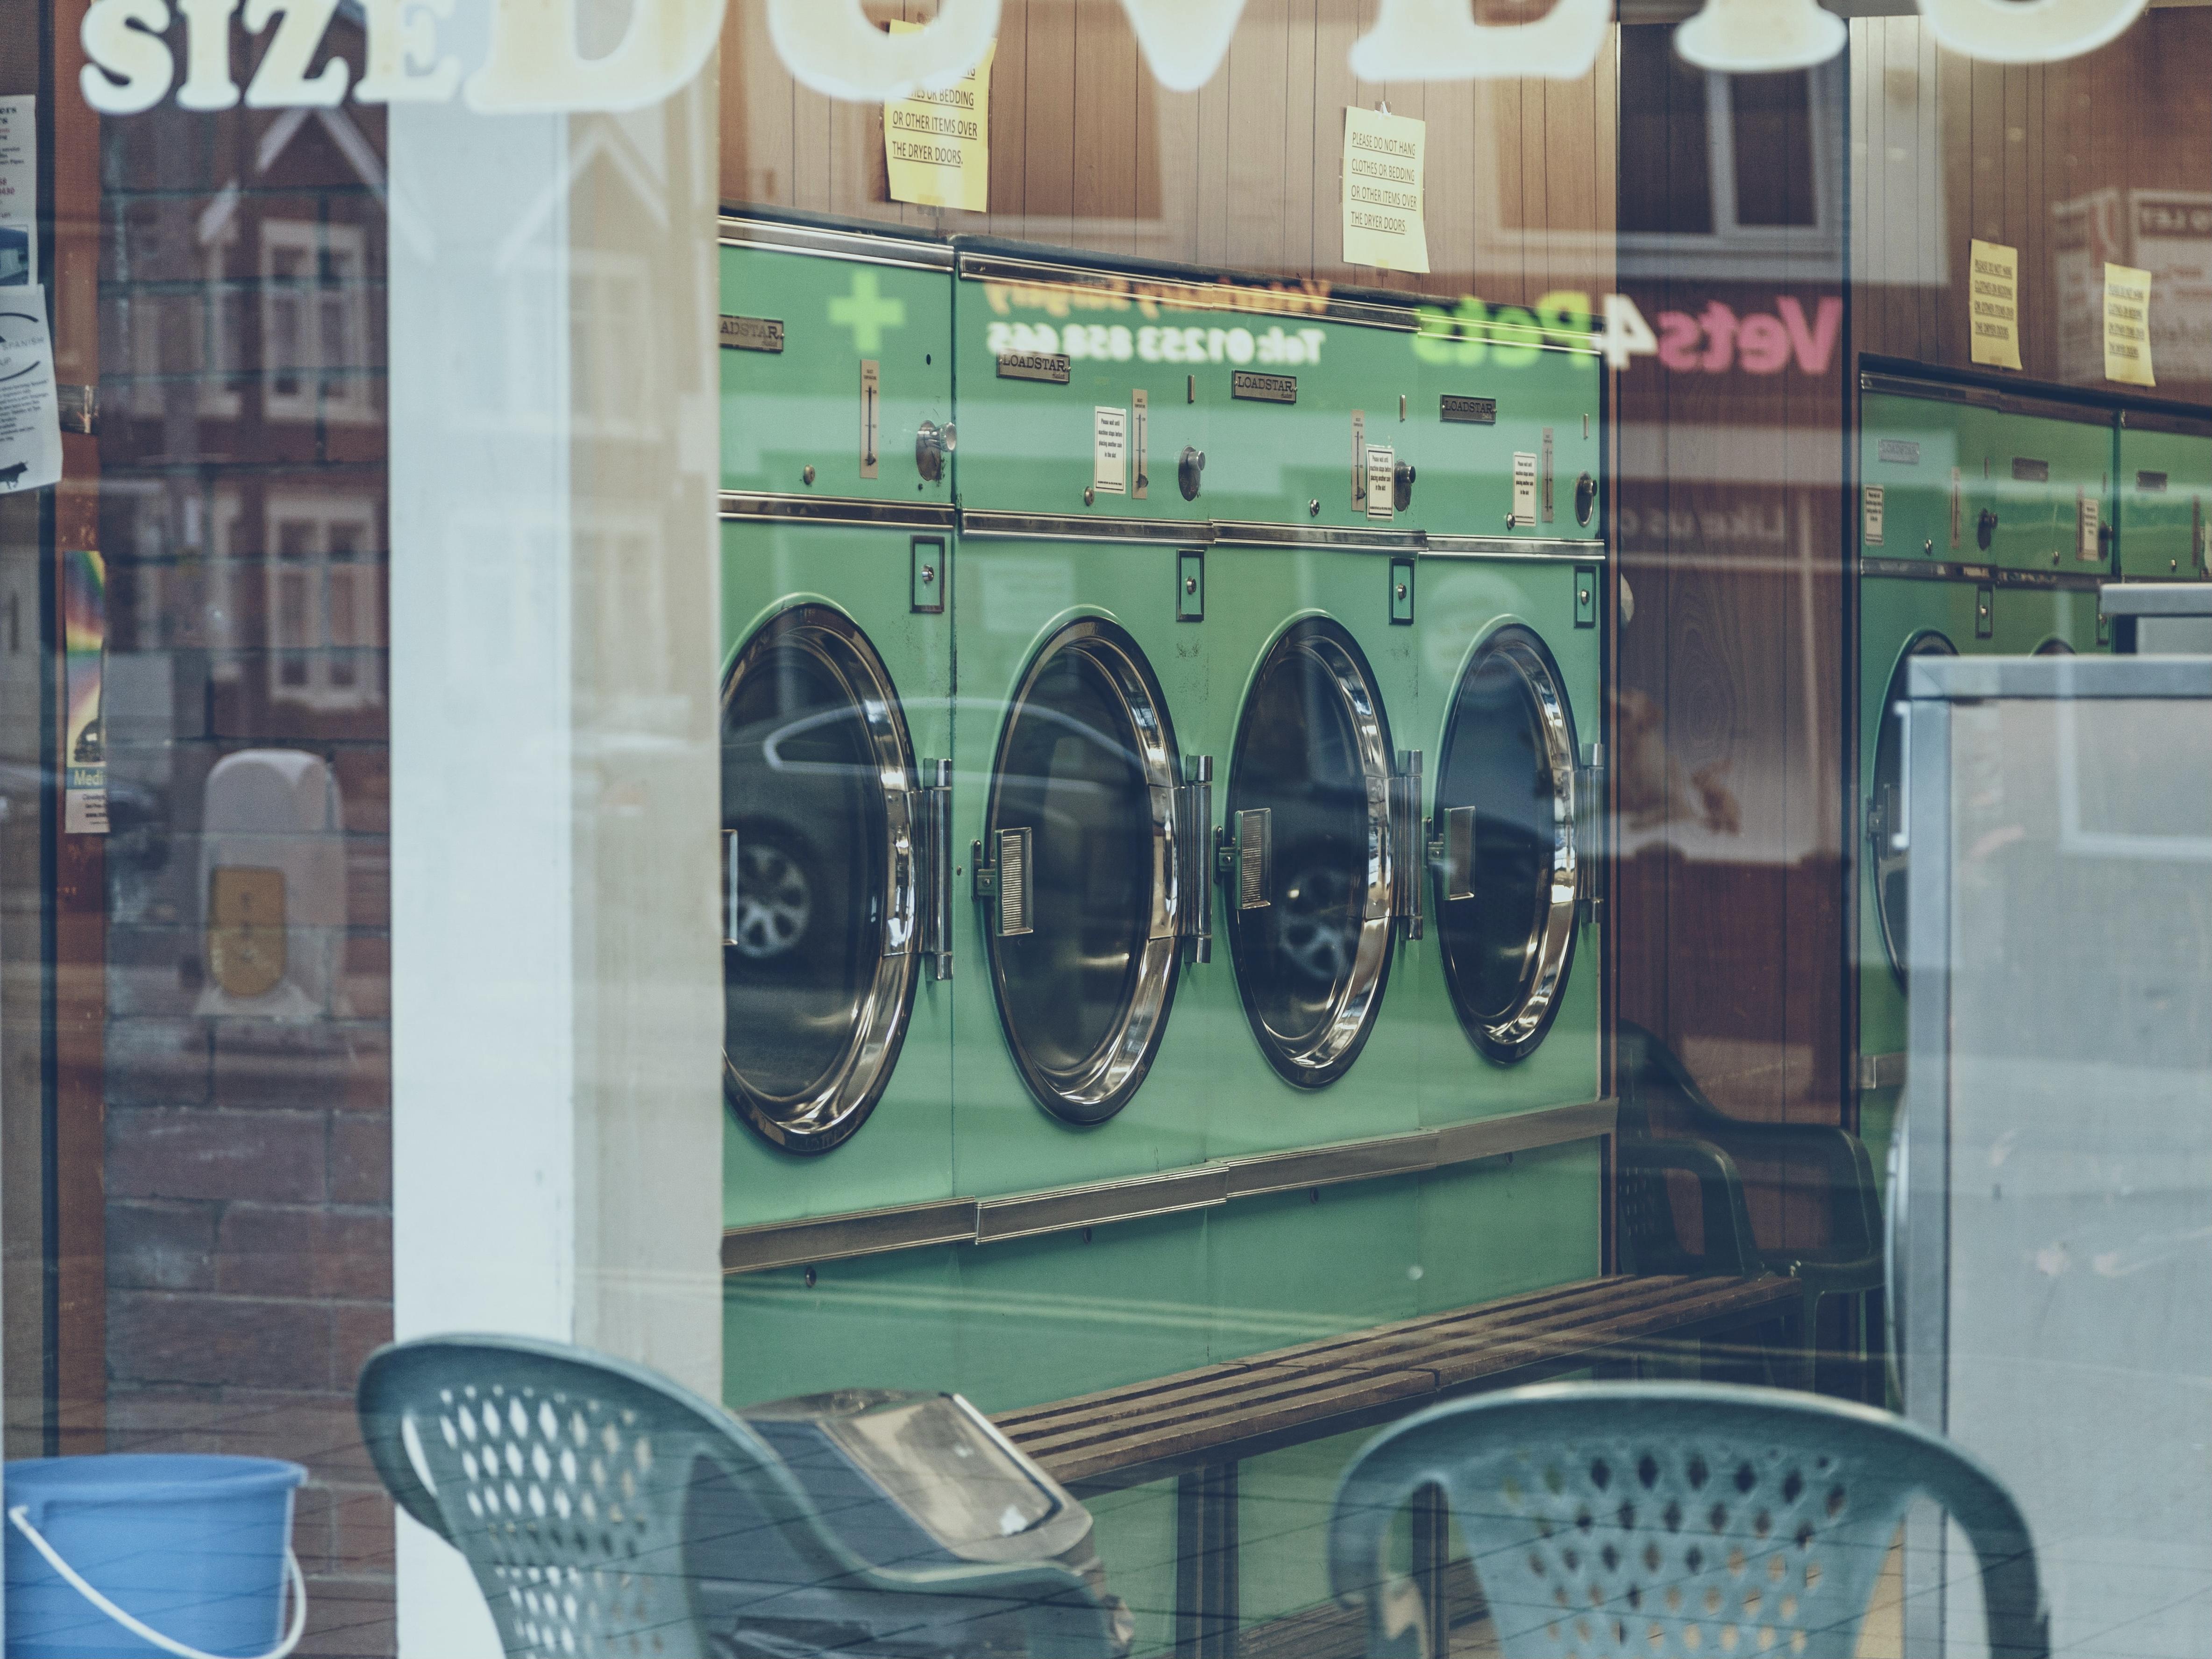 Laundry. Image Credit: Dimitri Houtteman/Unsplash